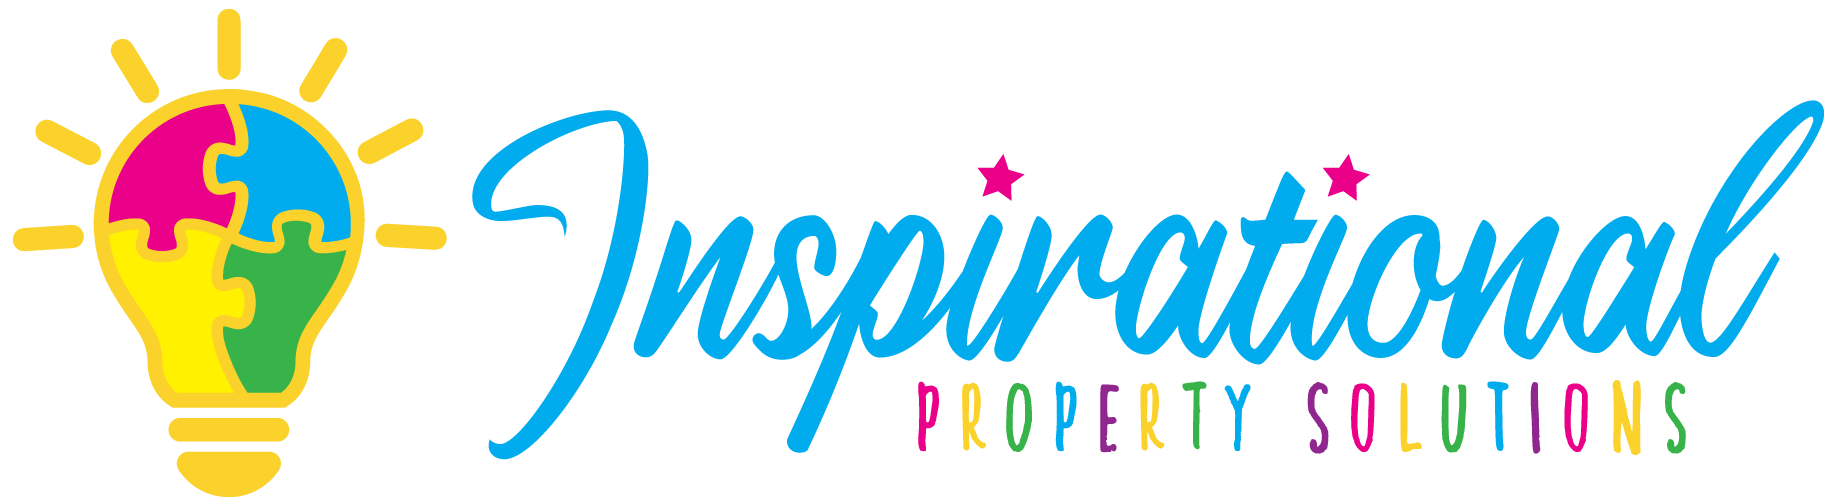 Property_Solutions_Landscape.png